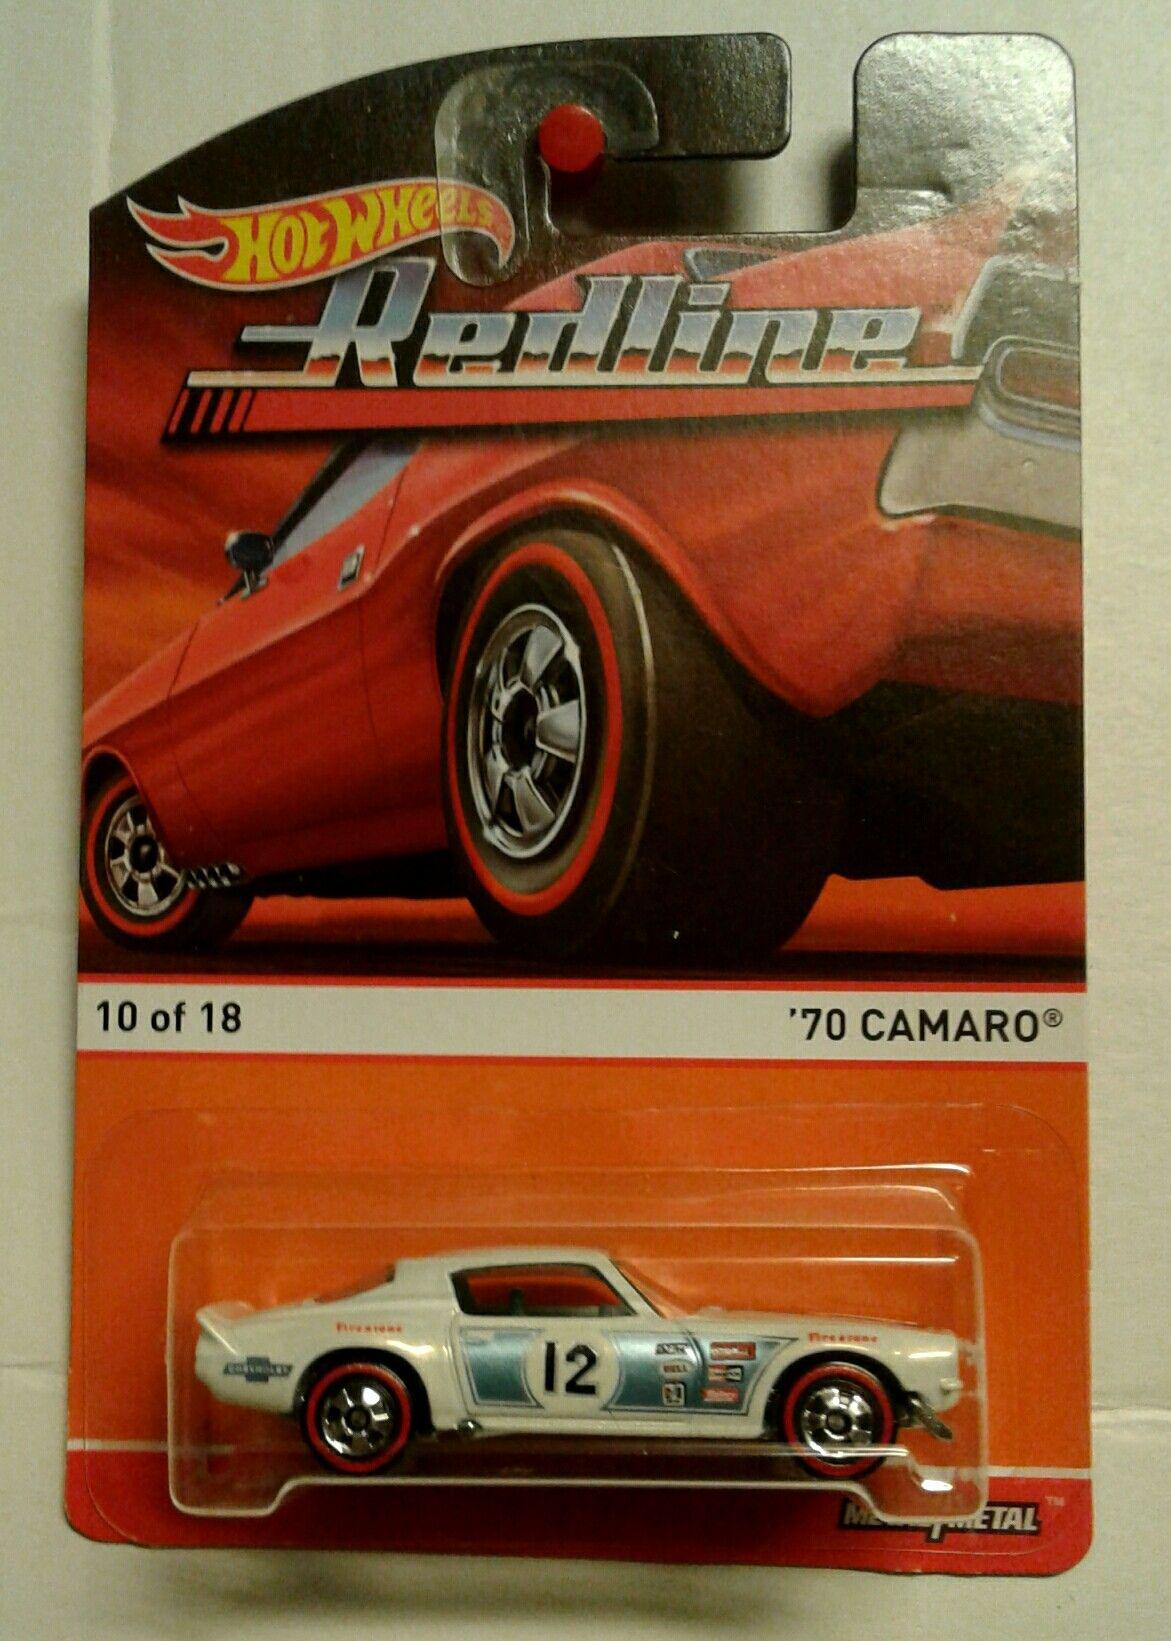 Hot Wheels Redline 70 Camaro Price 6 50 70 Camaro Hot